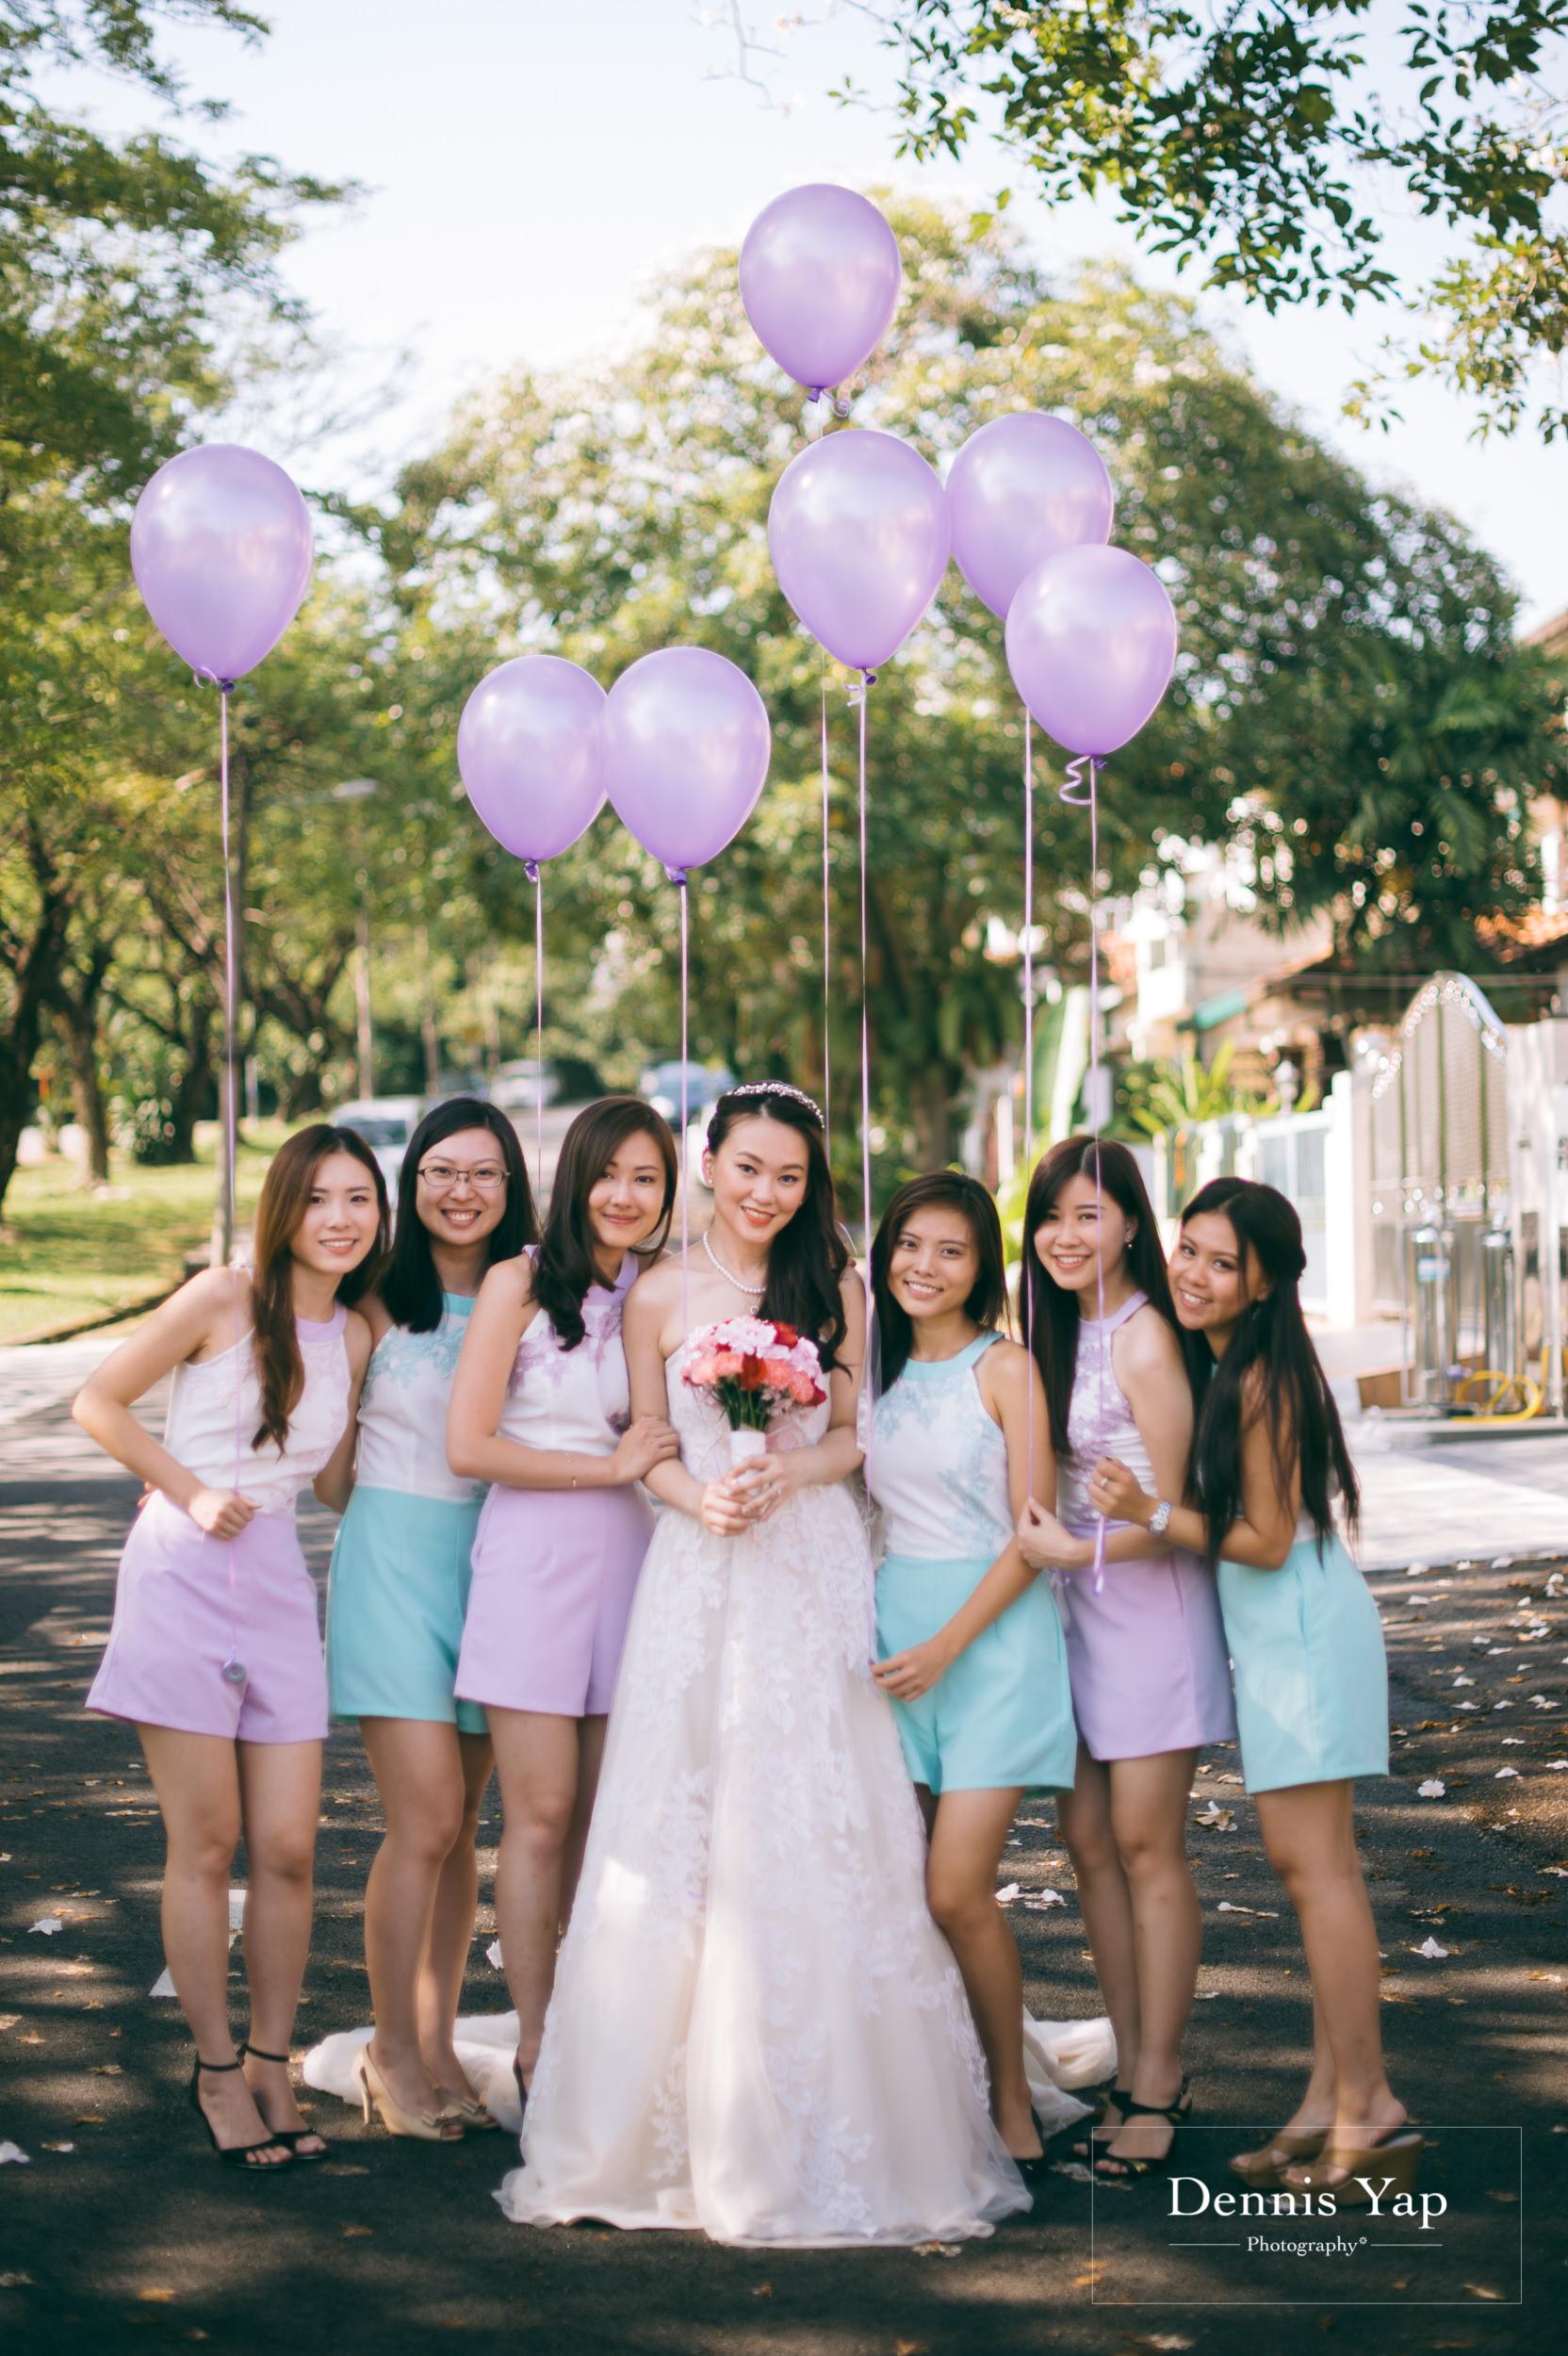 ethan juli wedding day gate crash wedding party dennis yap photography colors-34.jpg